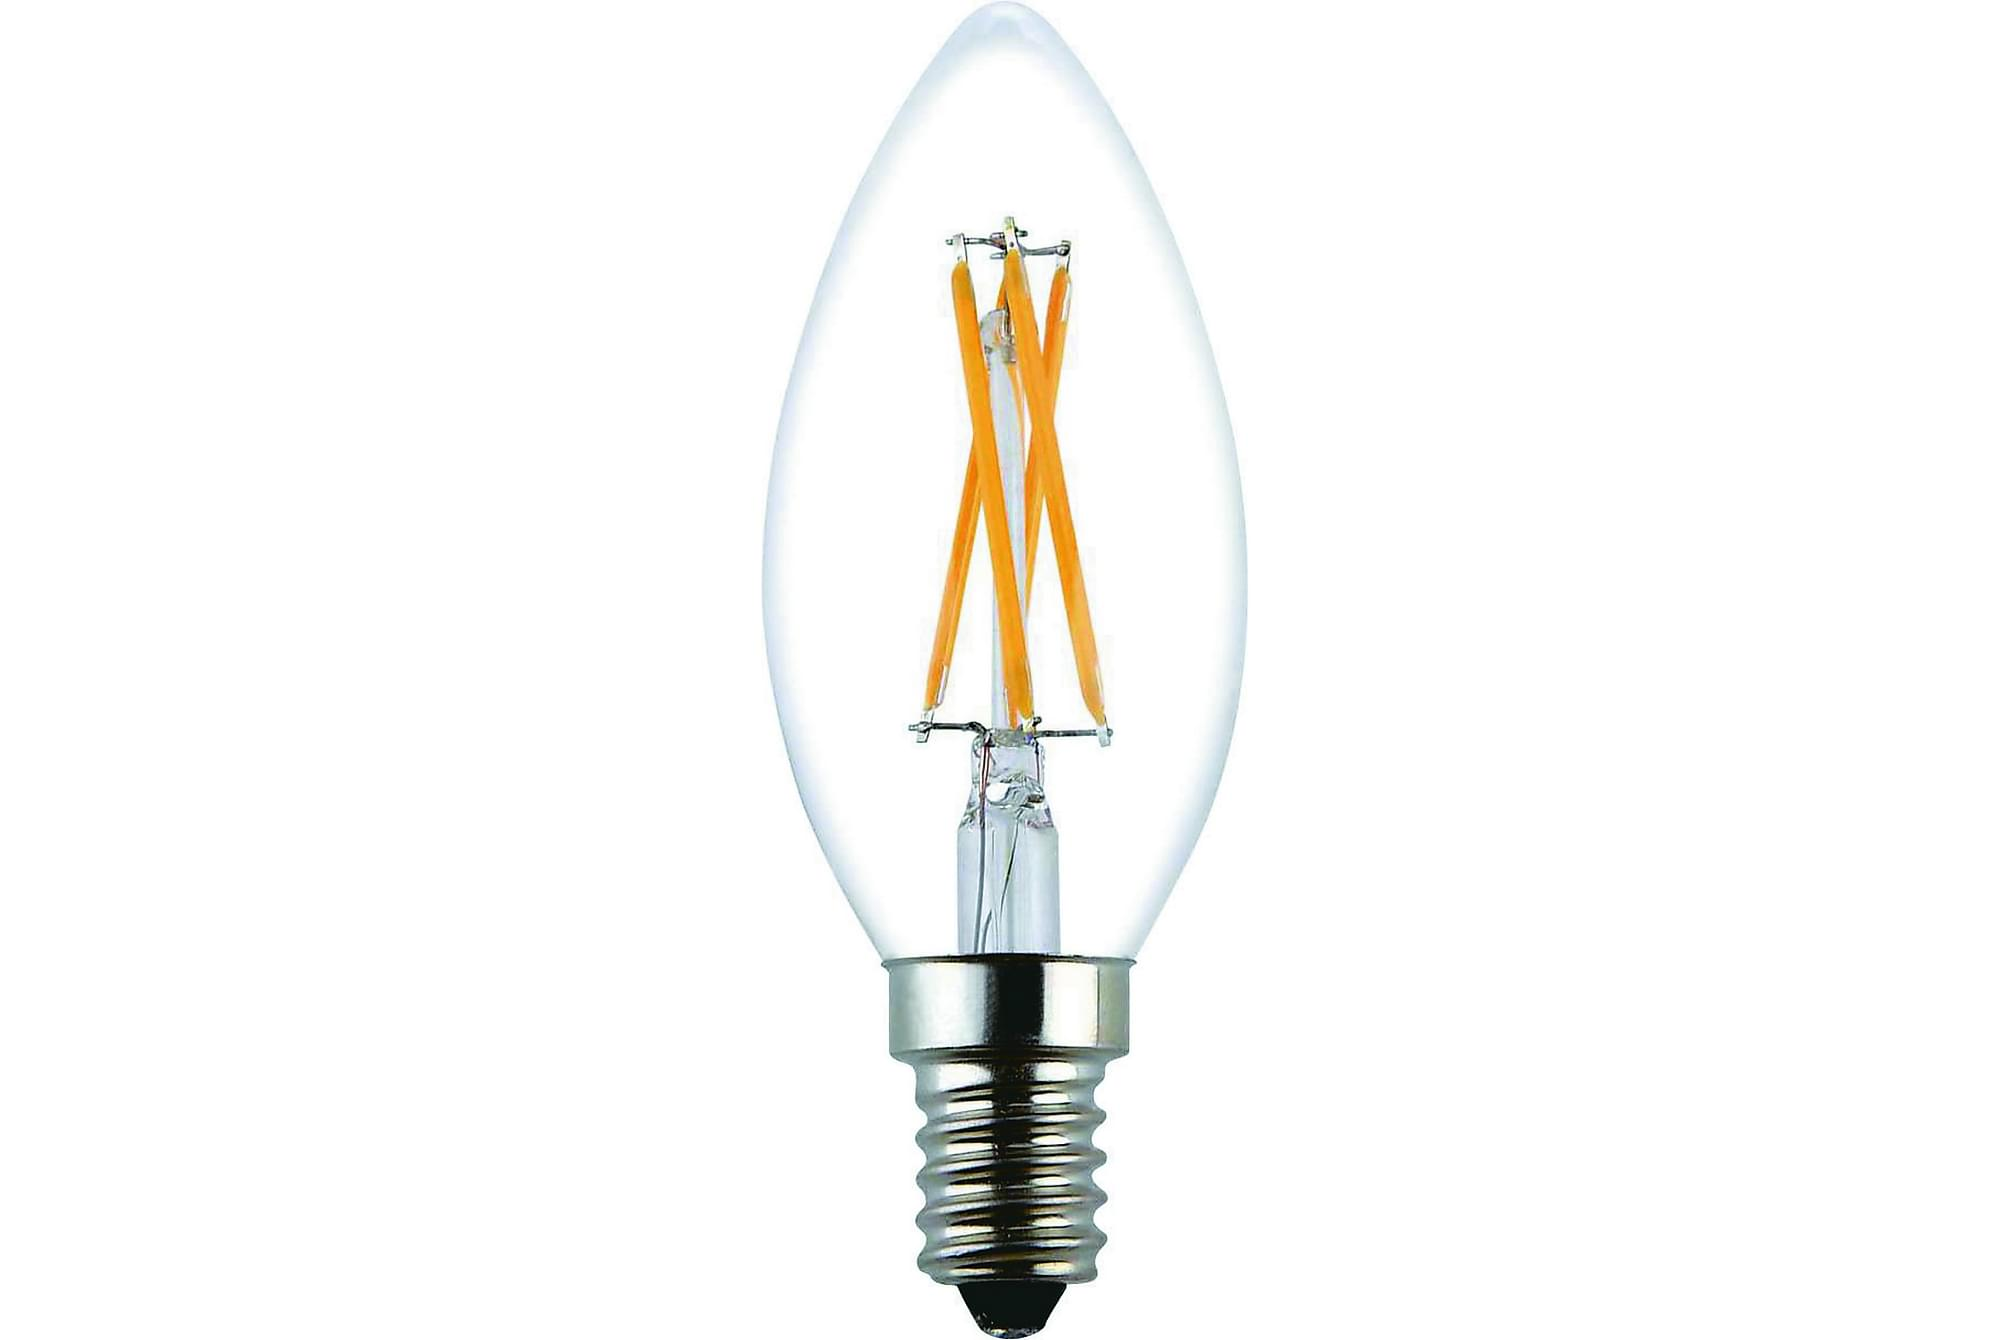 JUNG LED-lampa 3,6W E14 2700K Dim Filament Klar, Glödlampor & ljuskällor